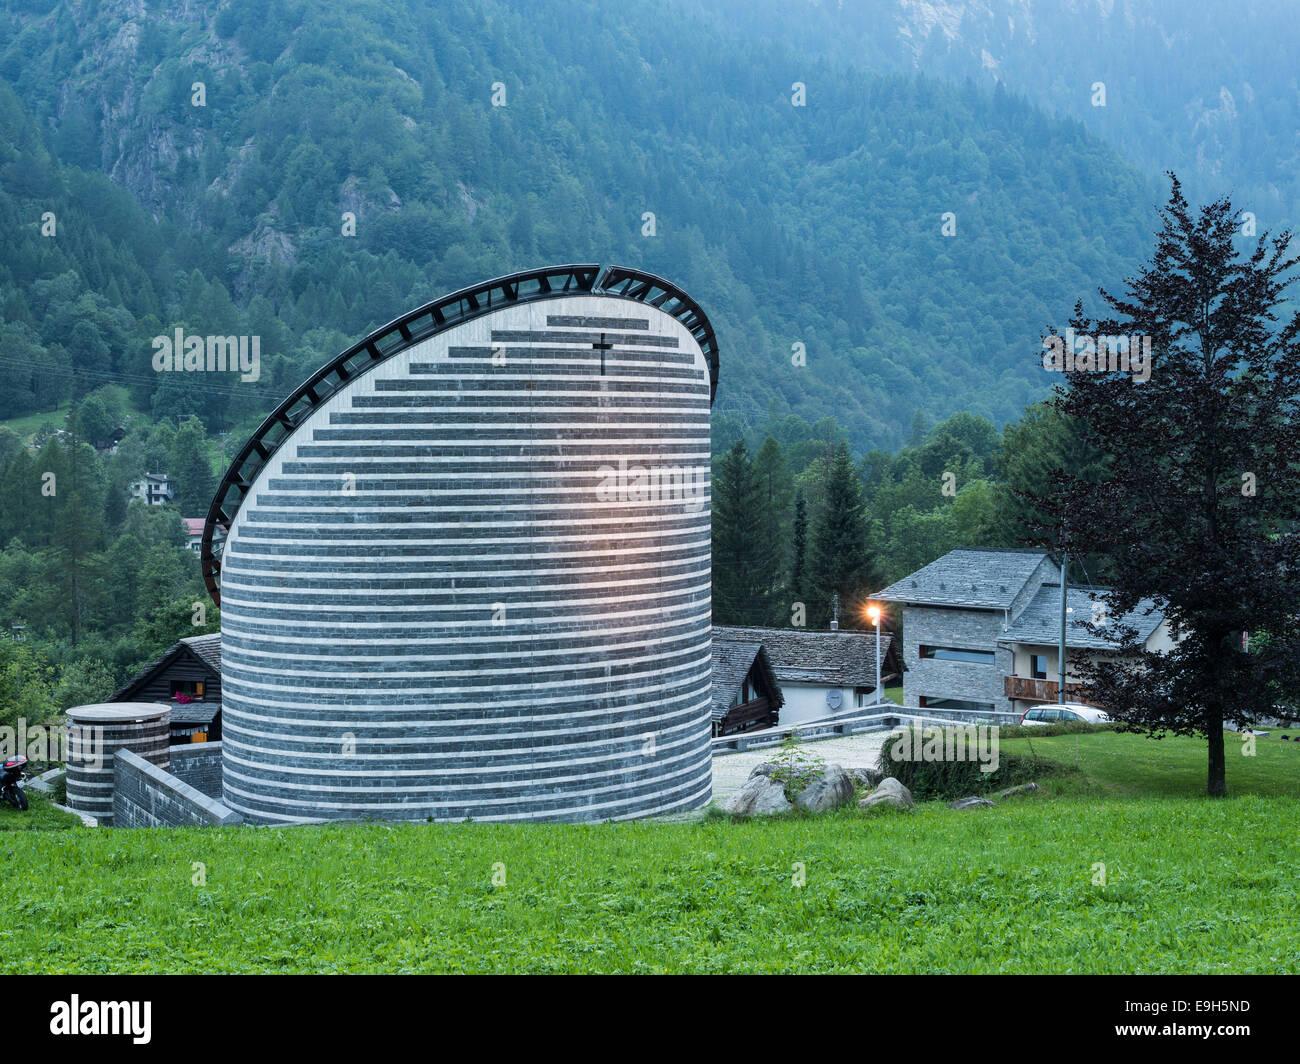 Iglesia parroquial de San Giovanni Battista, arquitectura moderna por Mario Botta, Mogno, Lavizzara, Cantón del Tesino, Suiza Foto de stock